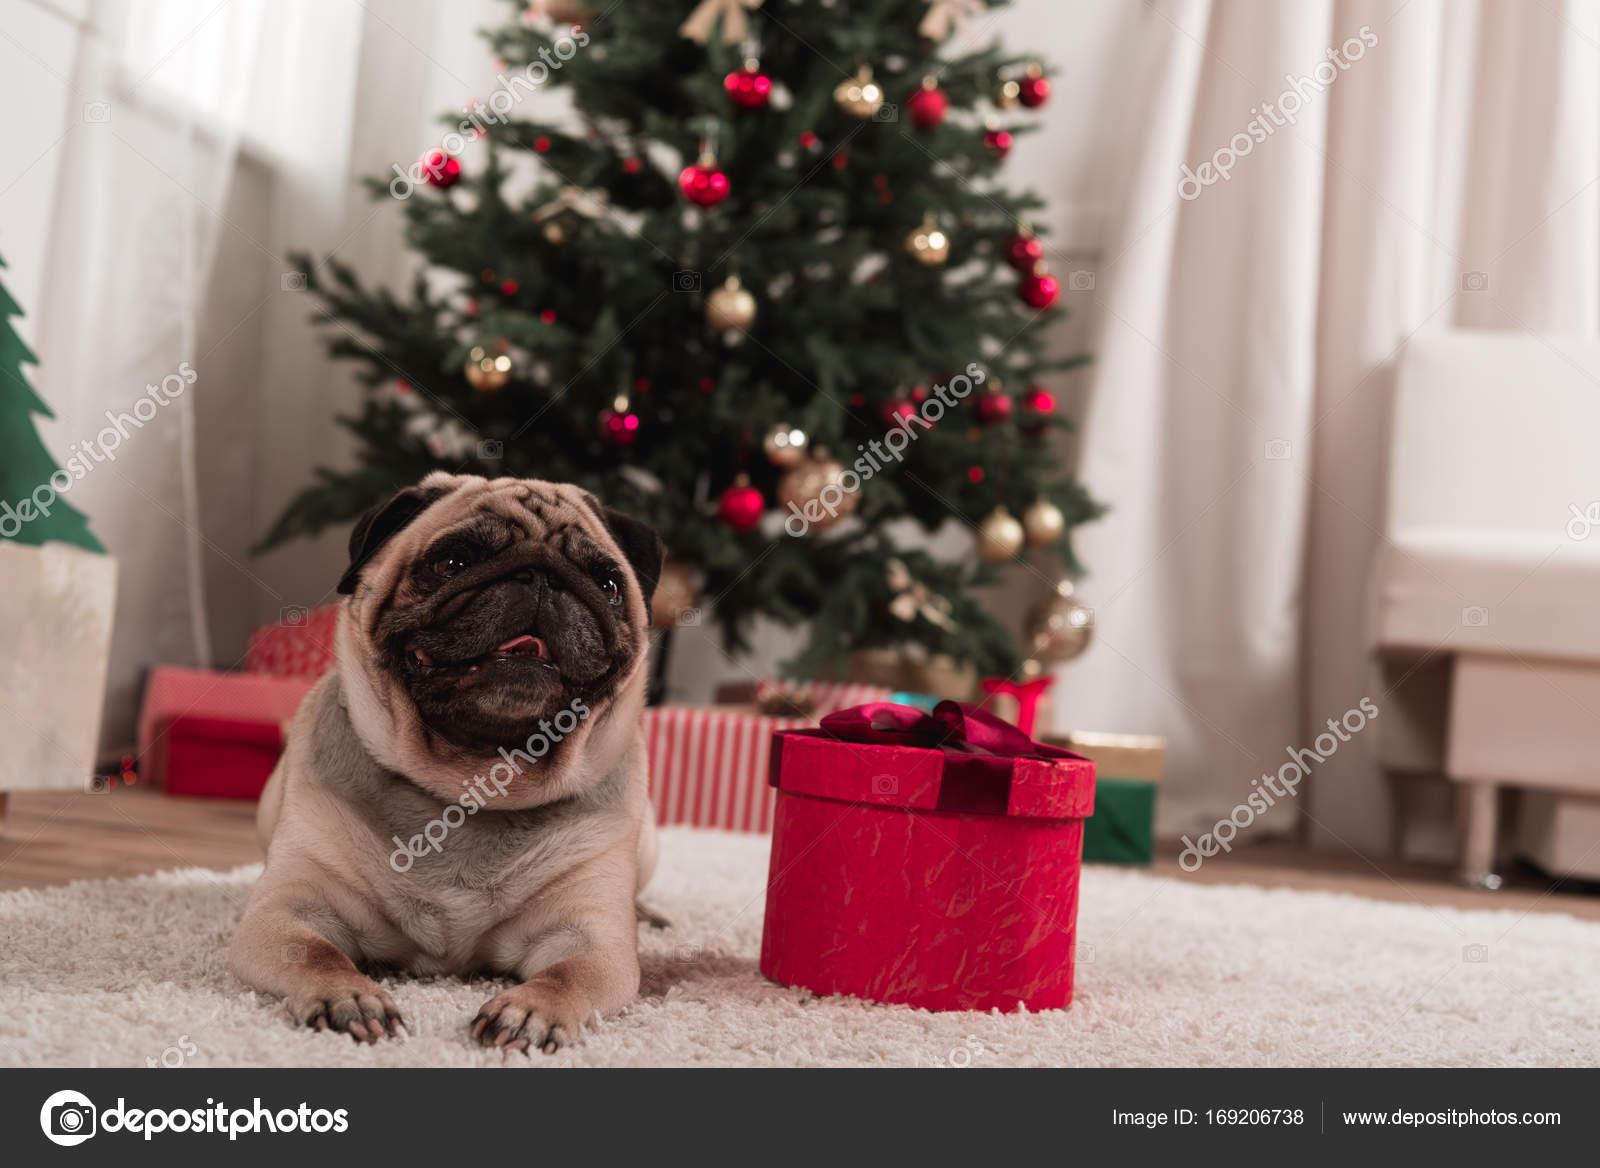 Mops mit Weihnachtsgeschenk — Stockfoto © AndrewLozovyi #169206738